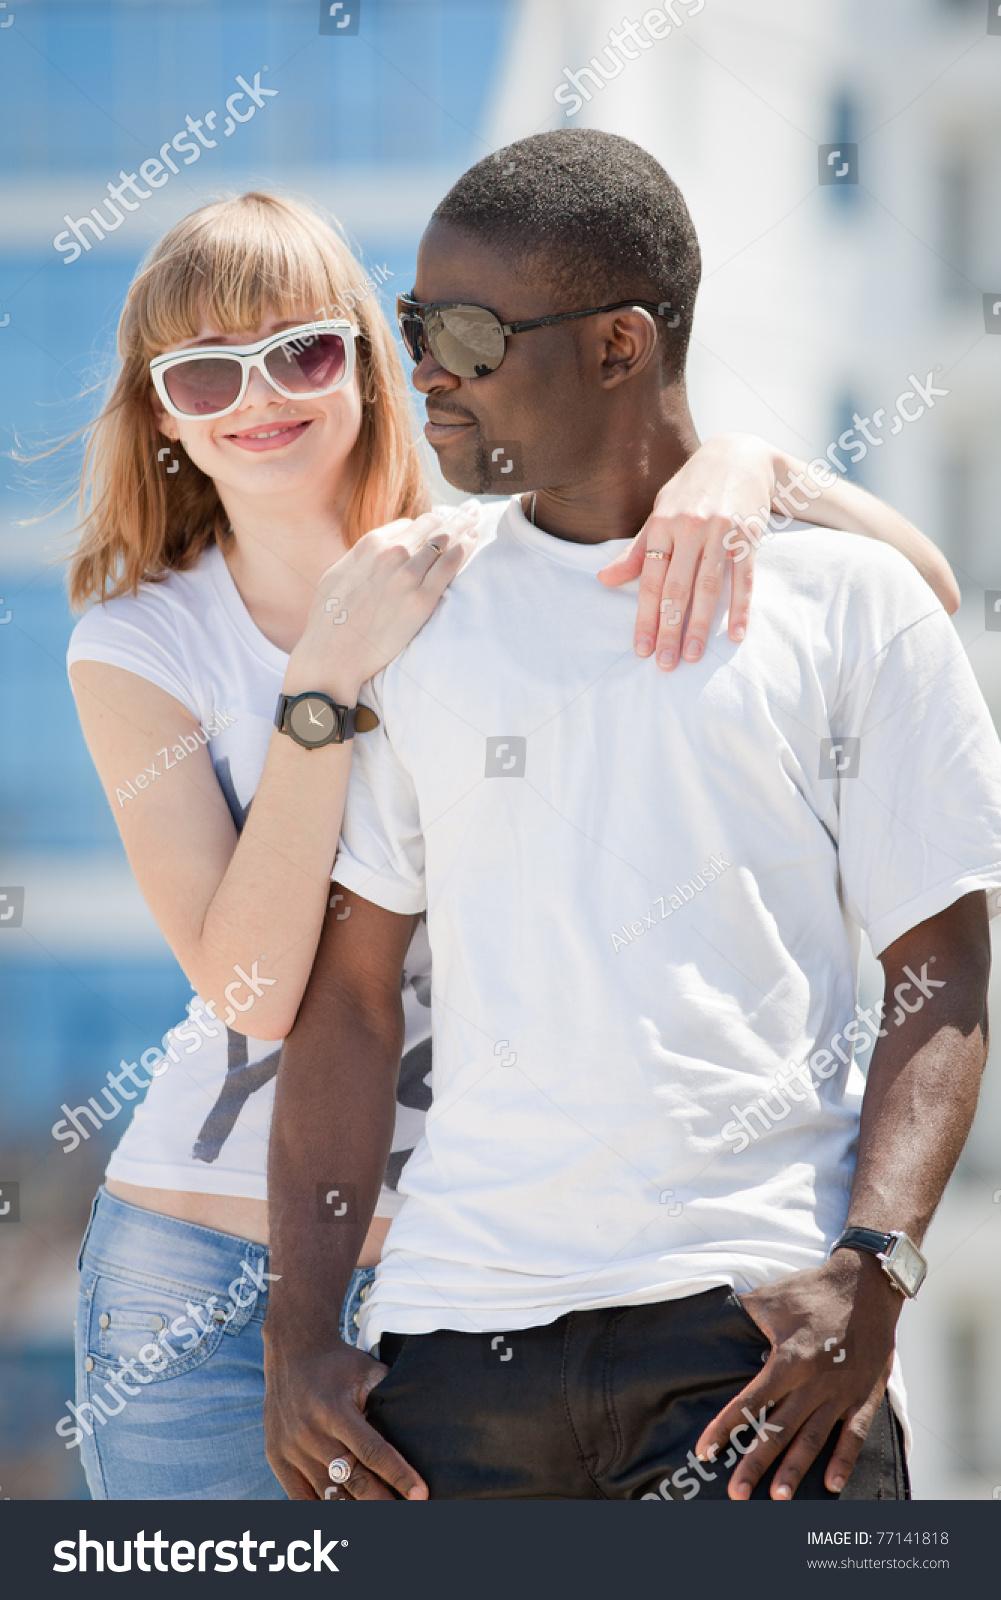 Black guy and girl